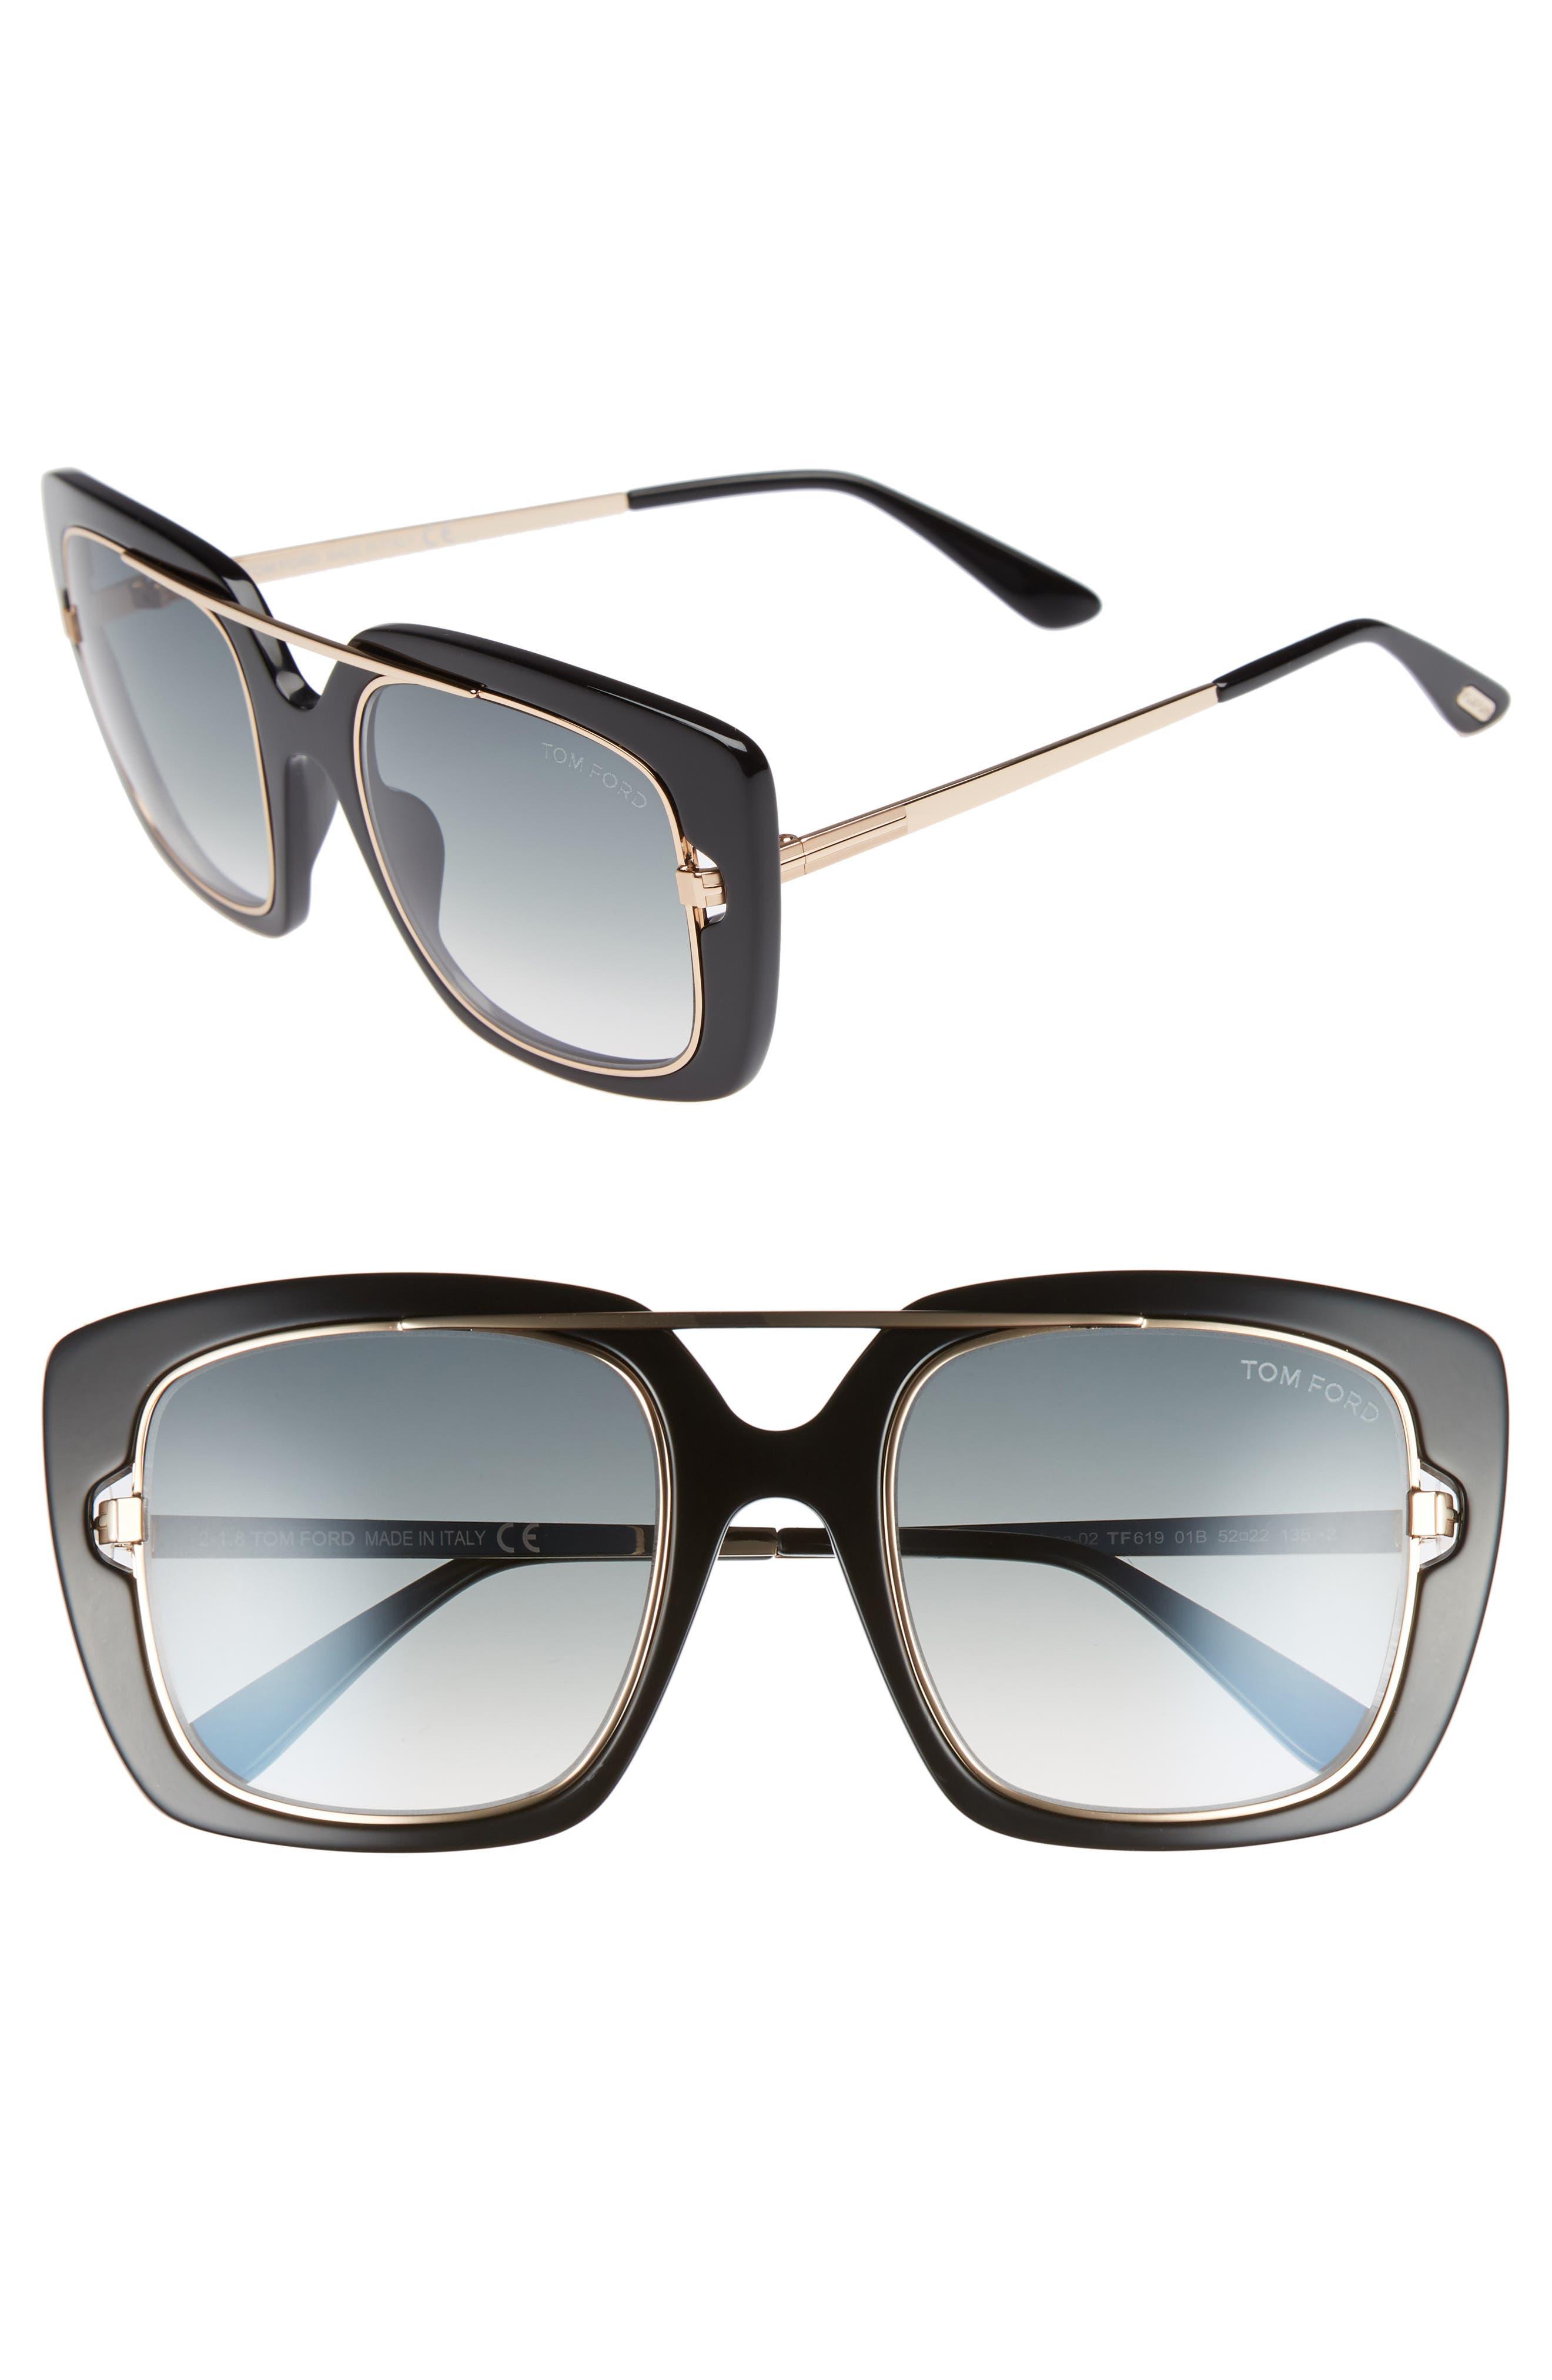 Marissa 52mm Sunglasses,                         Main,                         color, Shiny Black/ Gradient Smoke